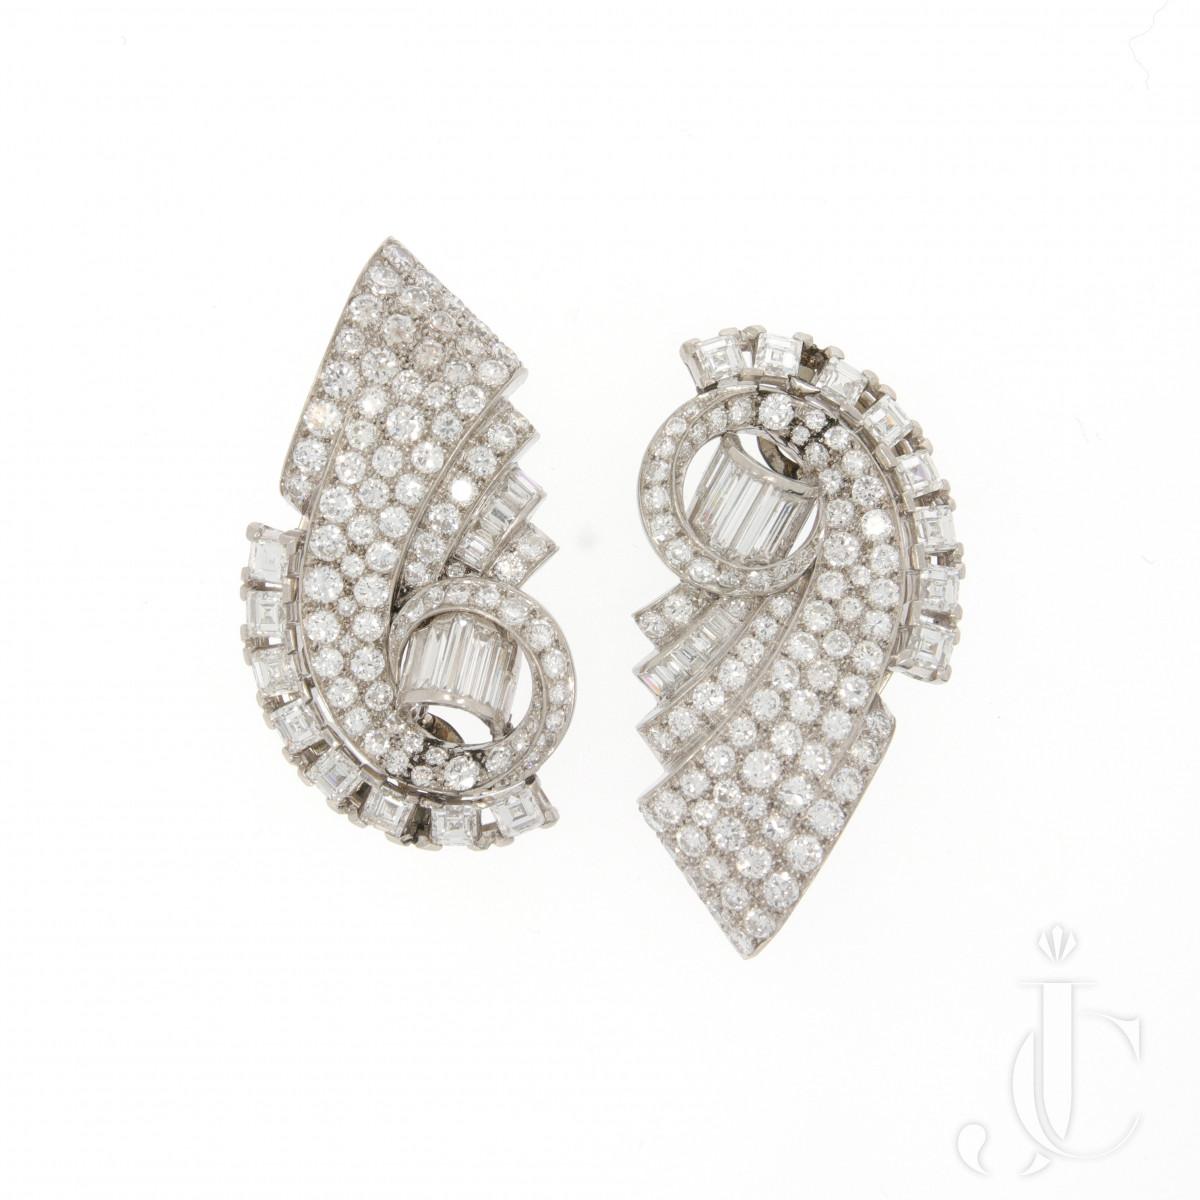 2 Diamond Dress Clips